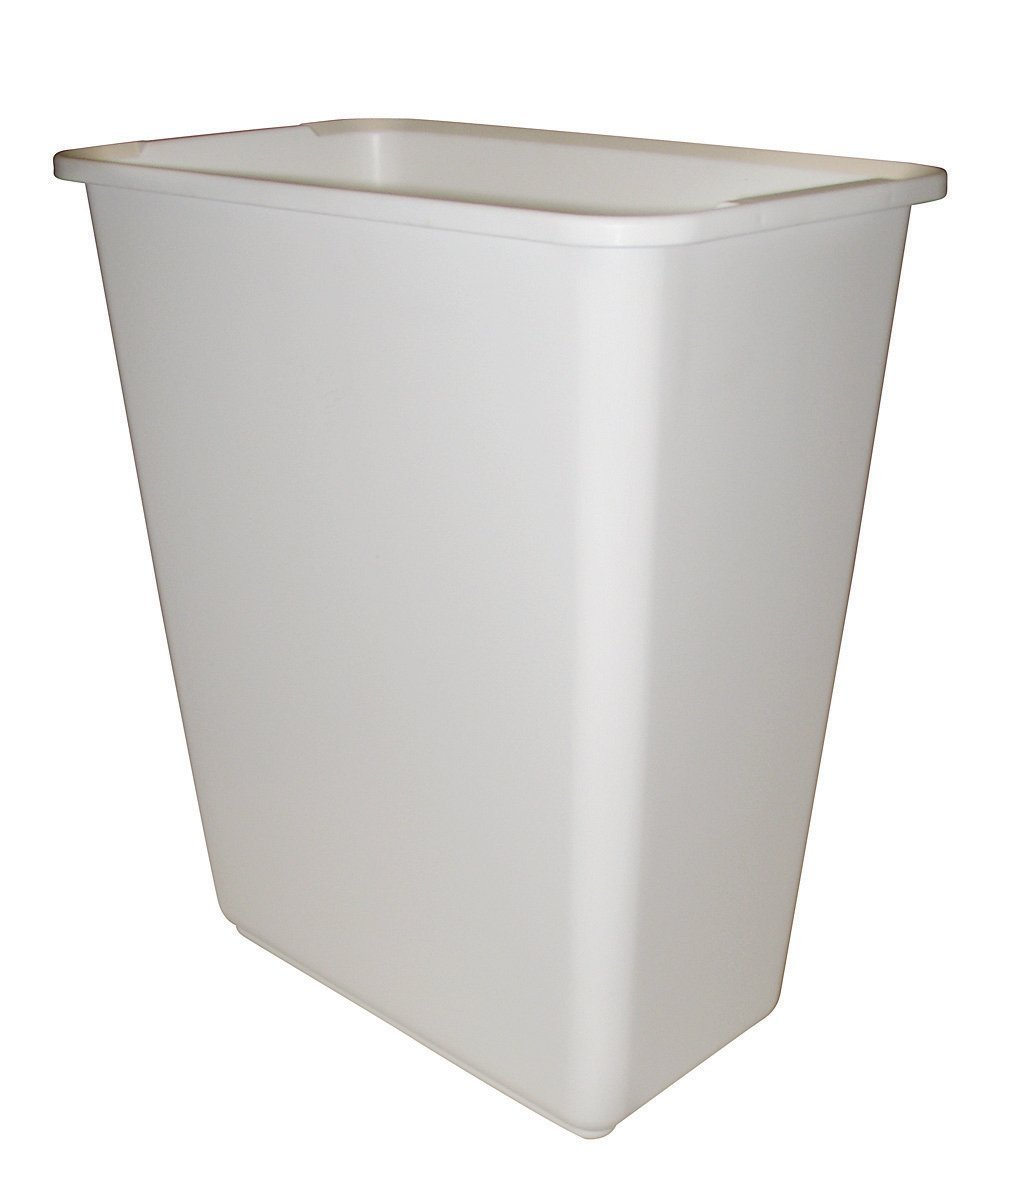 Rev-A-Shelf Replacement Waste Bin White-30 Quart by Rev-A-Shelf